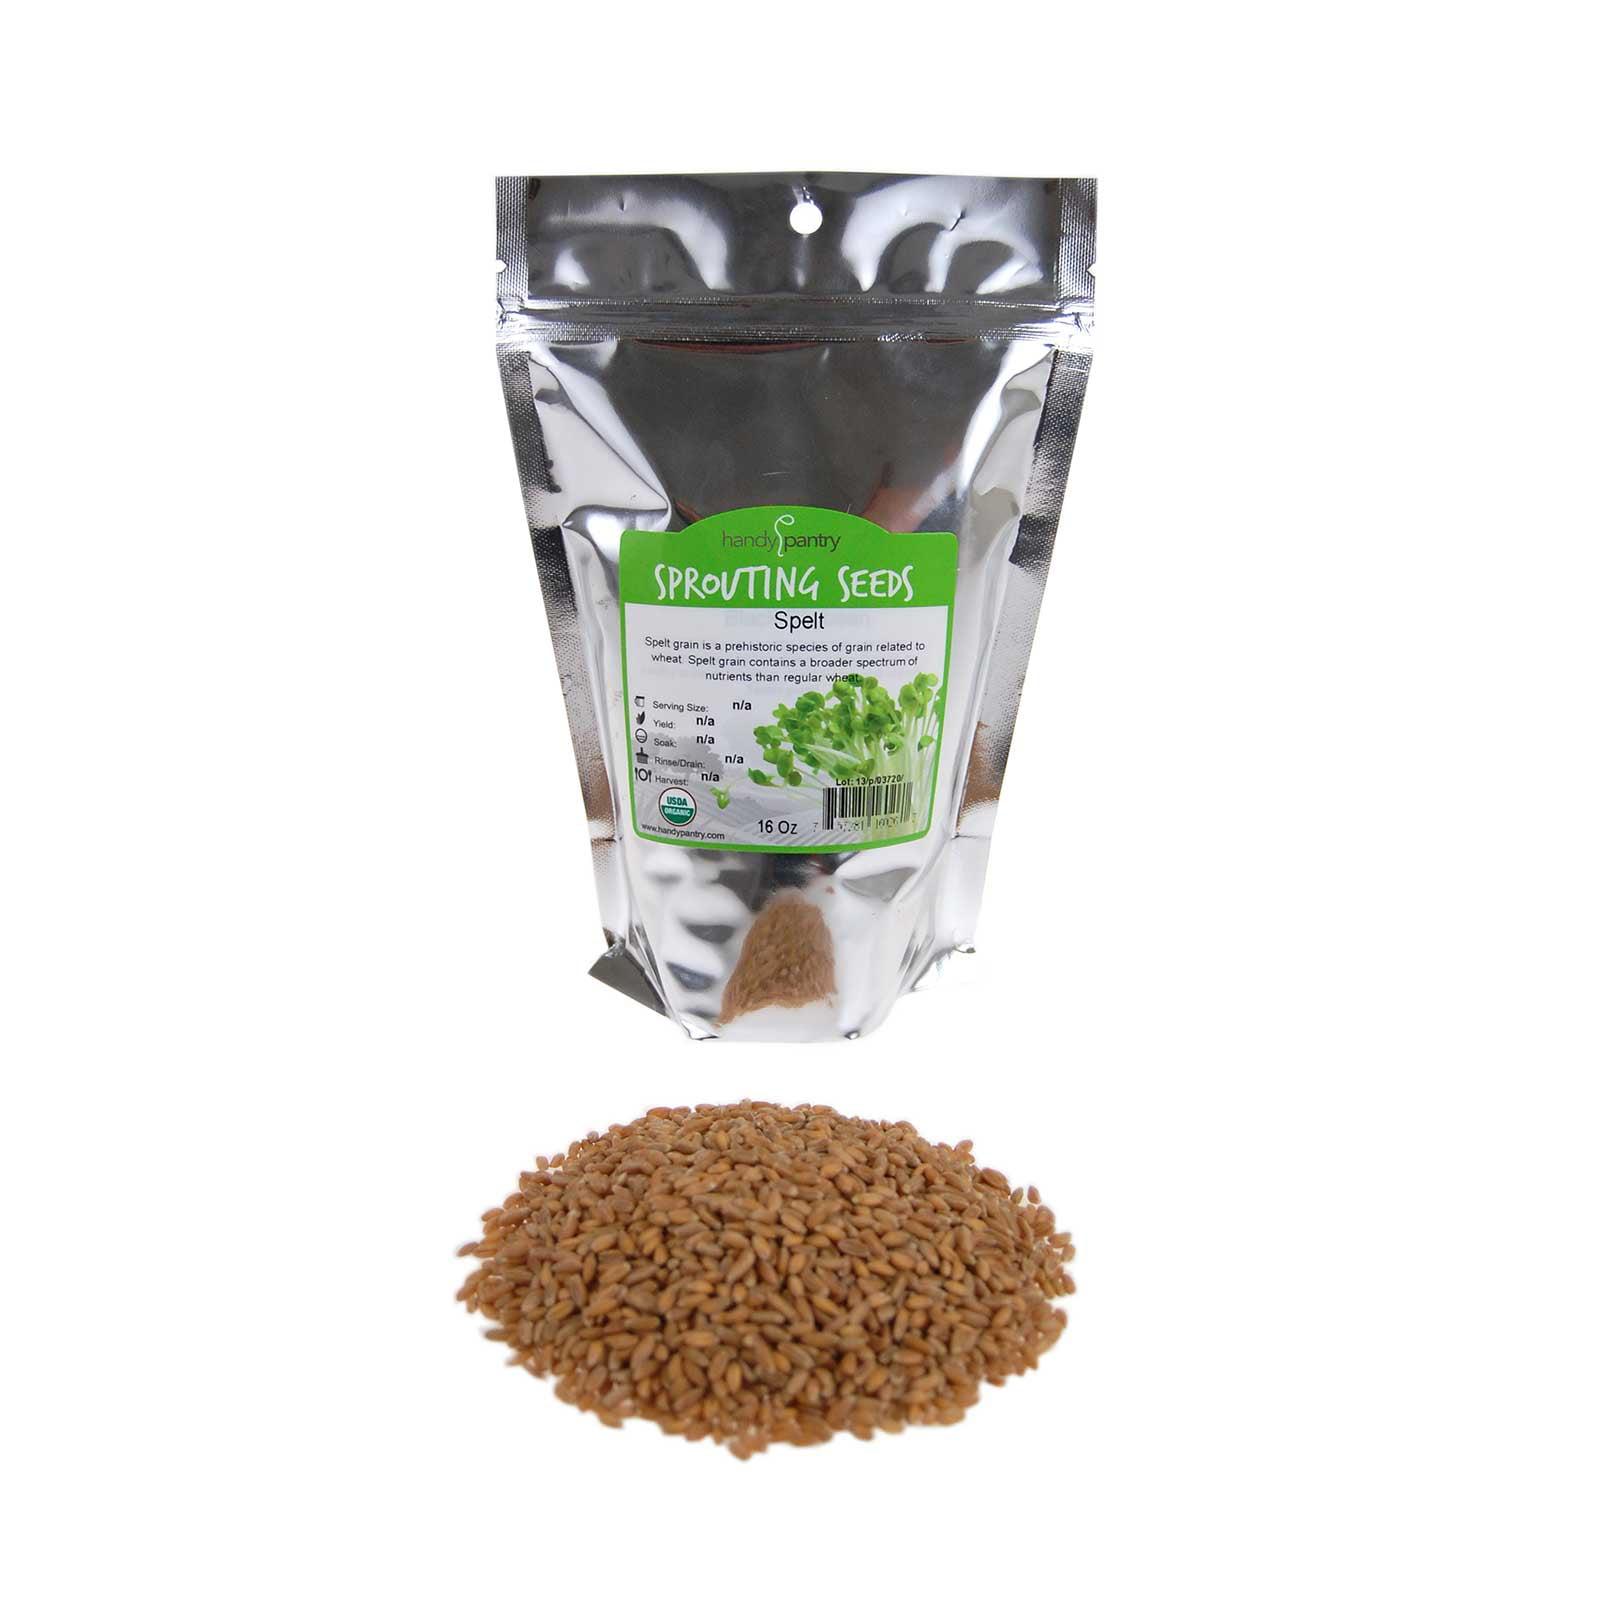 Organic Spelt- 1 Lbs- Grain Seeds: Flour, Bread, Baking, Cooking, Food Storage, Sprouting, Spelt Grass